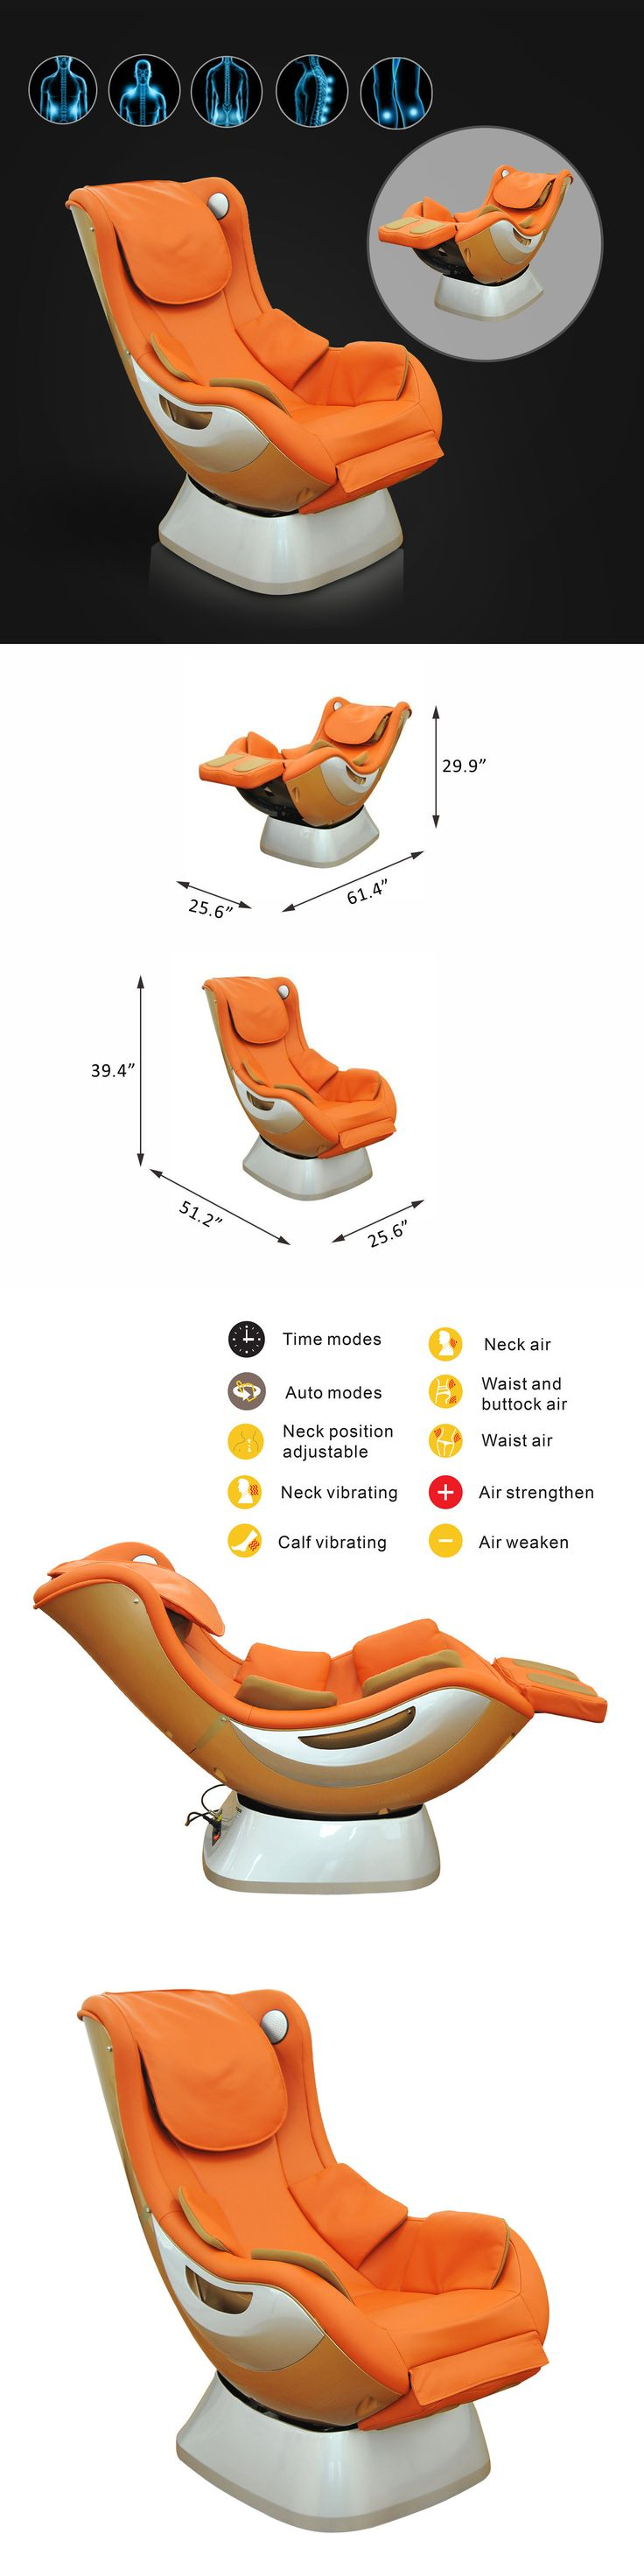 Electric Massage Chairs Electric Massage Chair Shiatsu